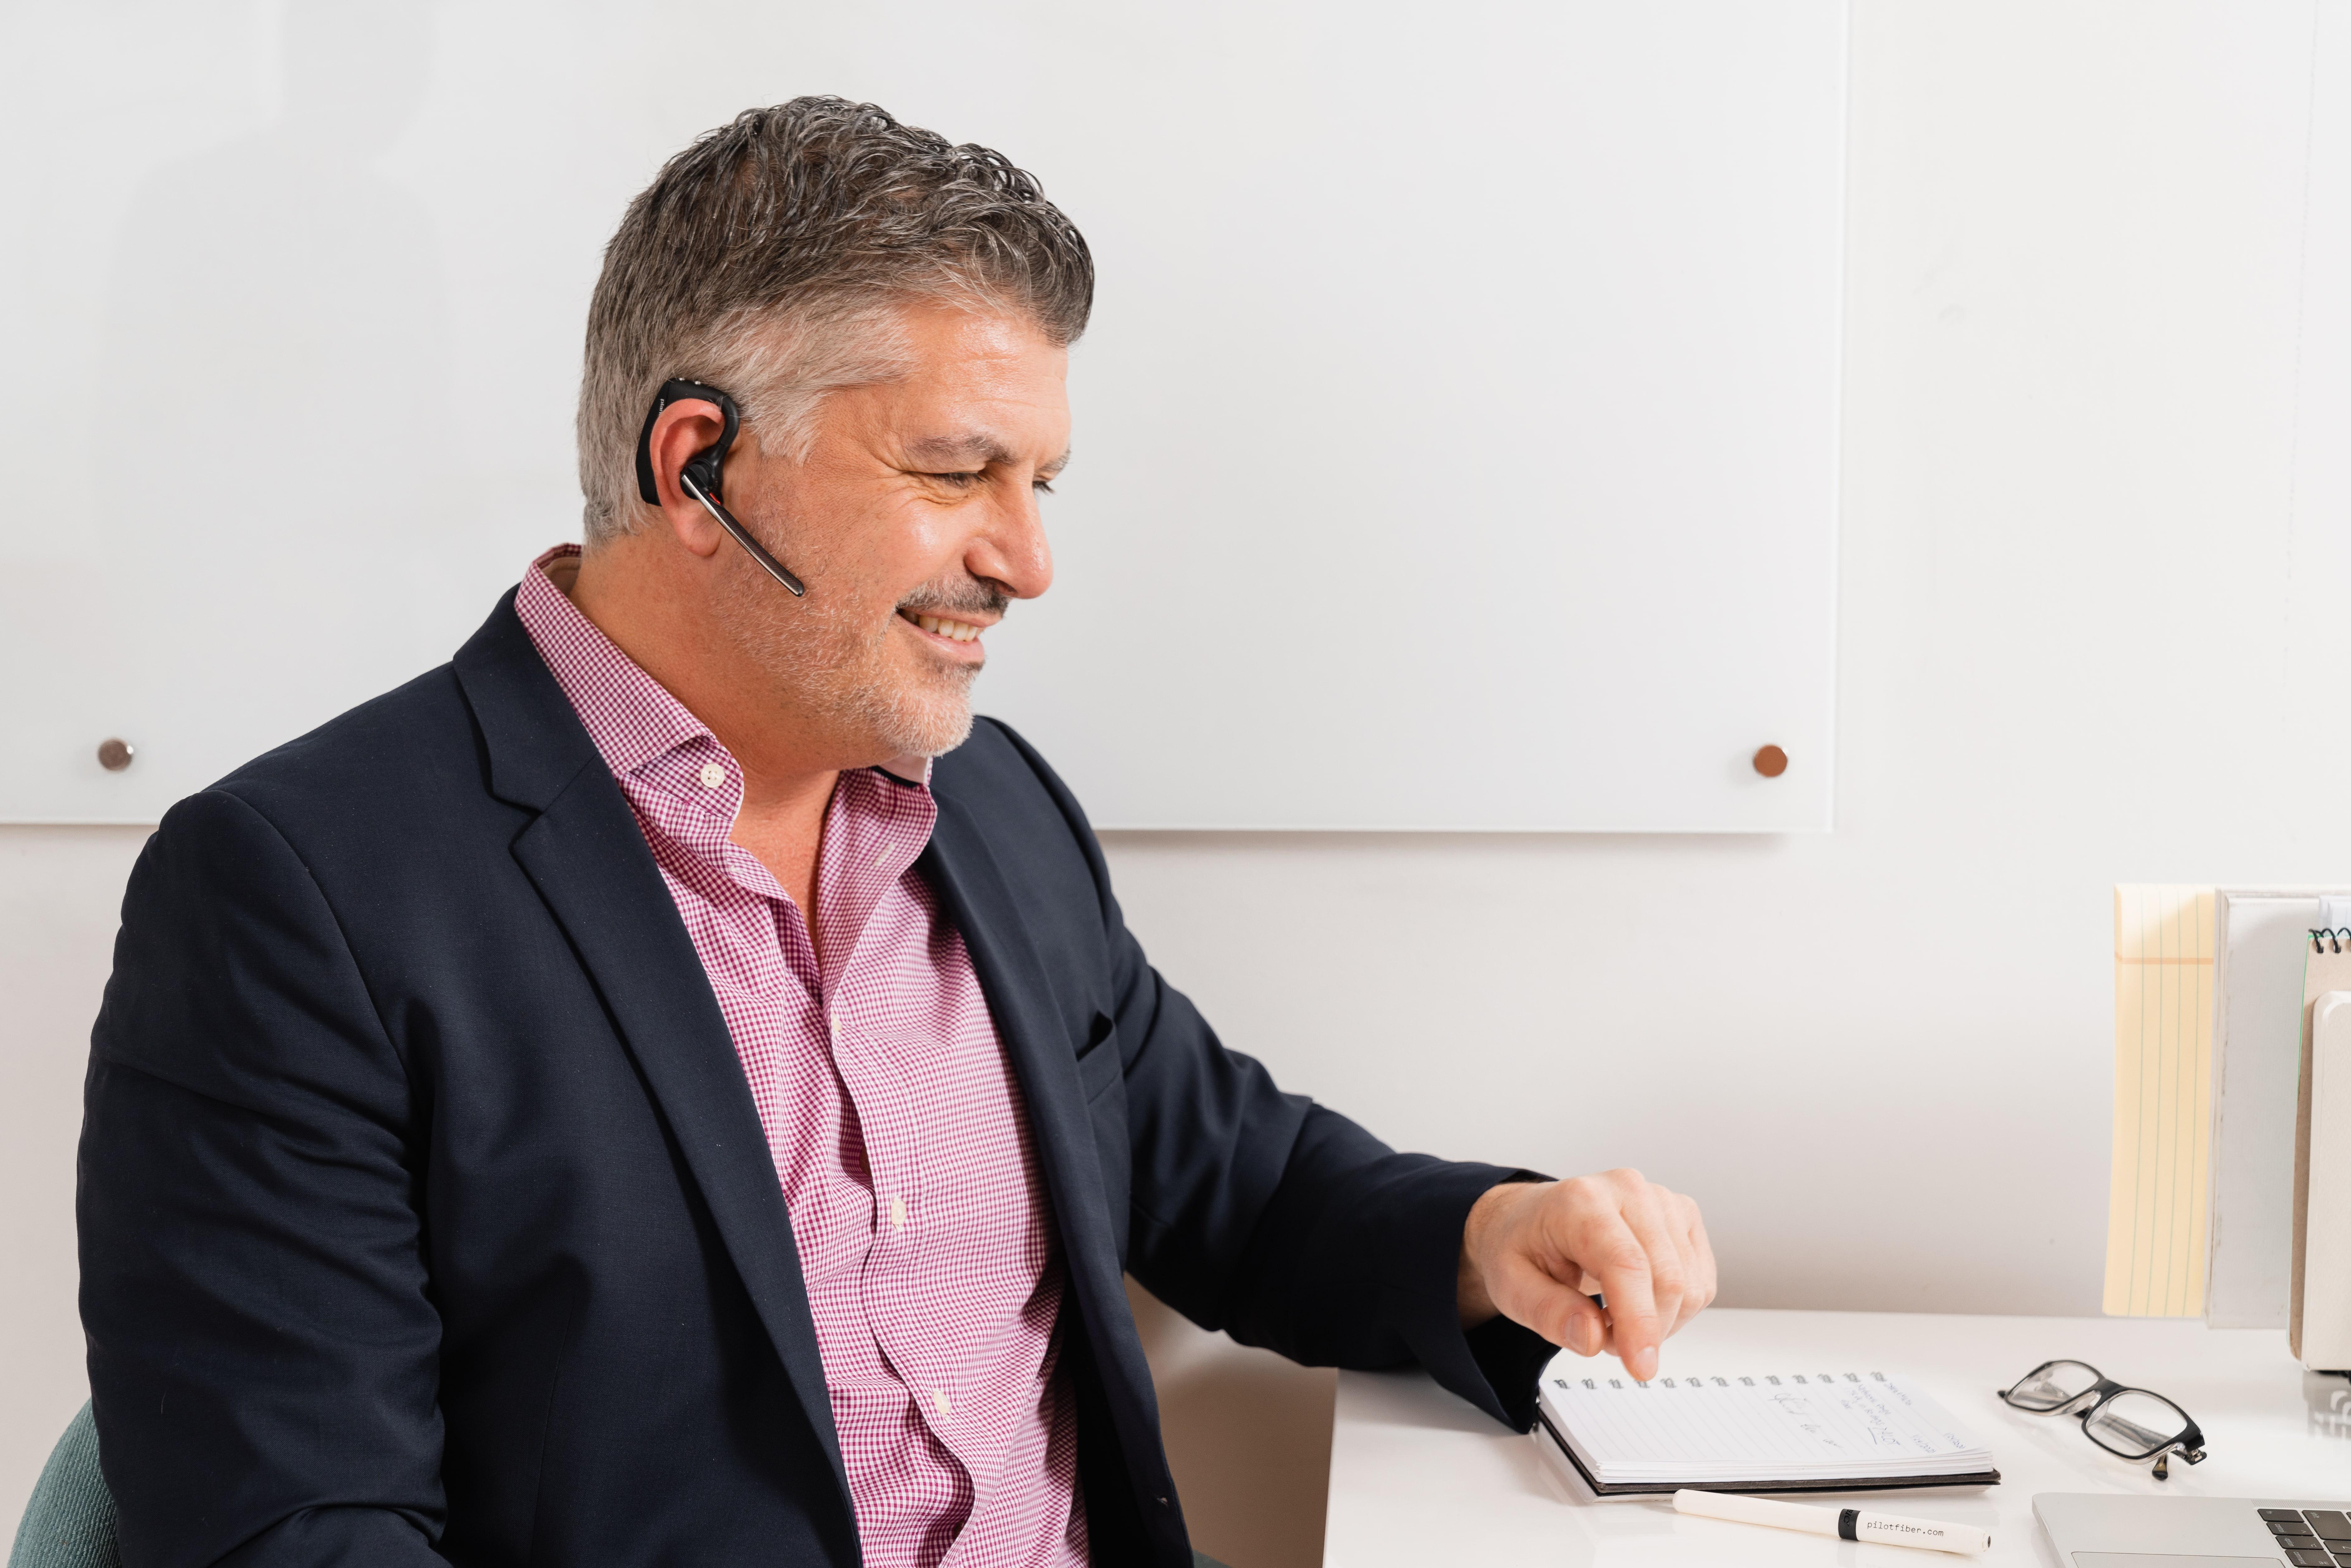 Man on a phone call wearing wireless headphones